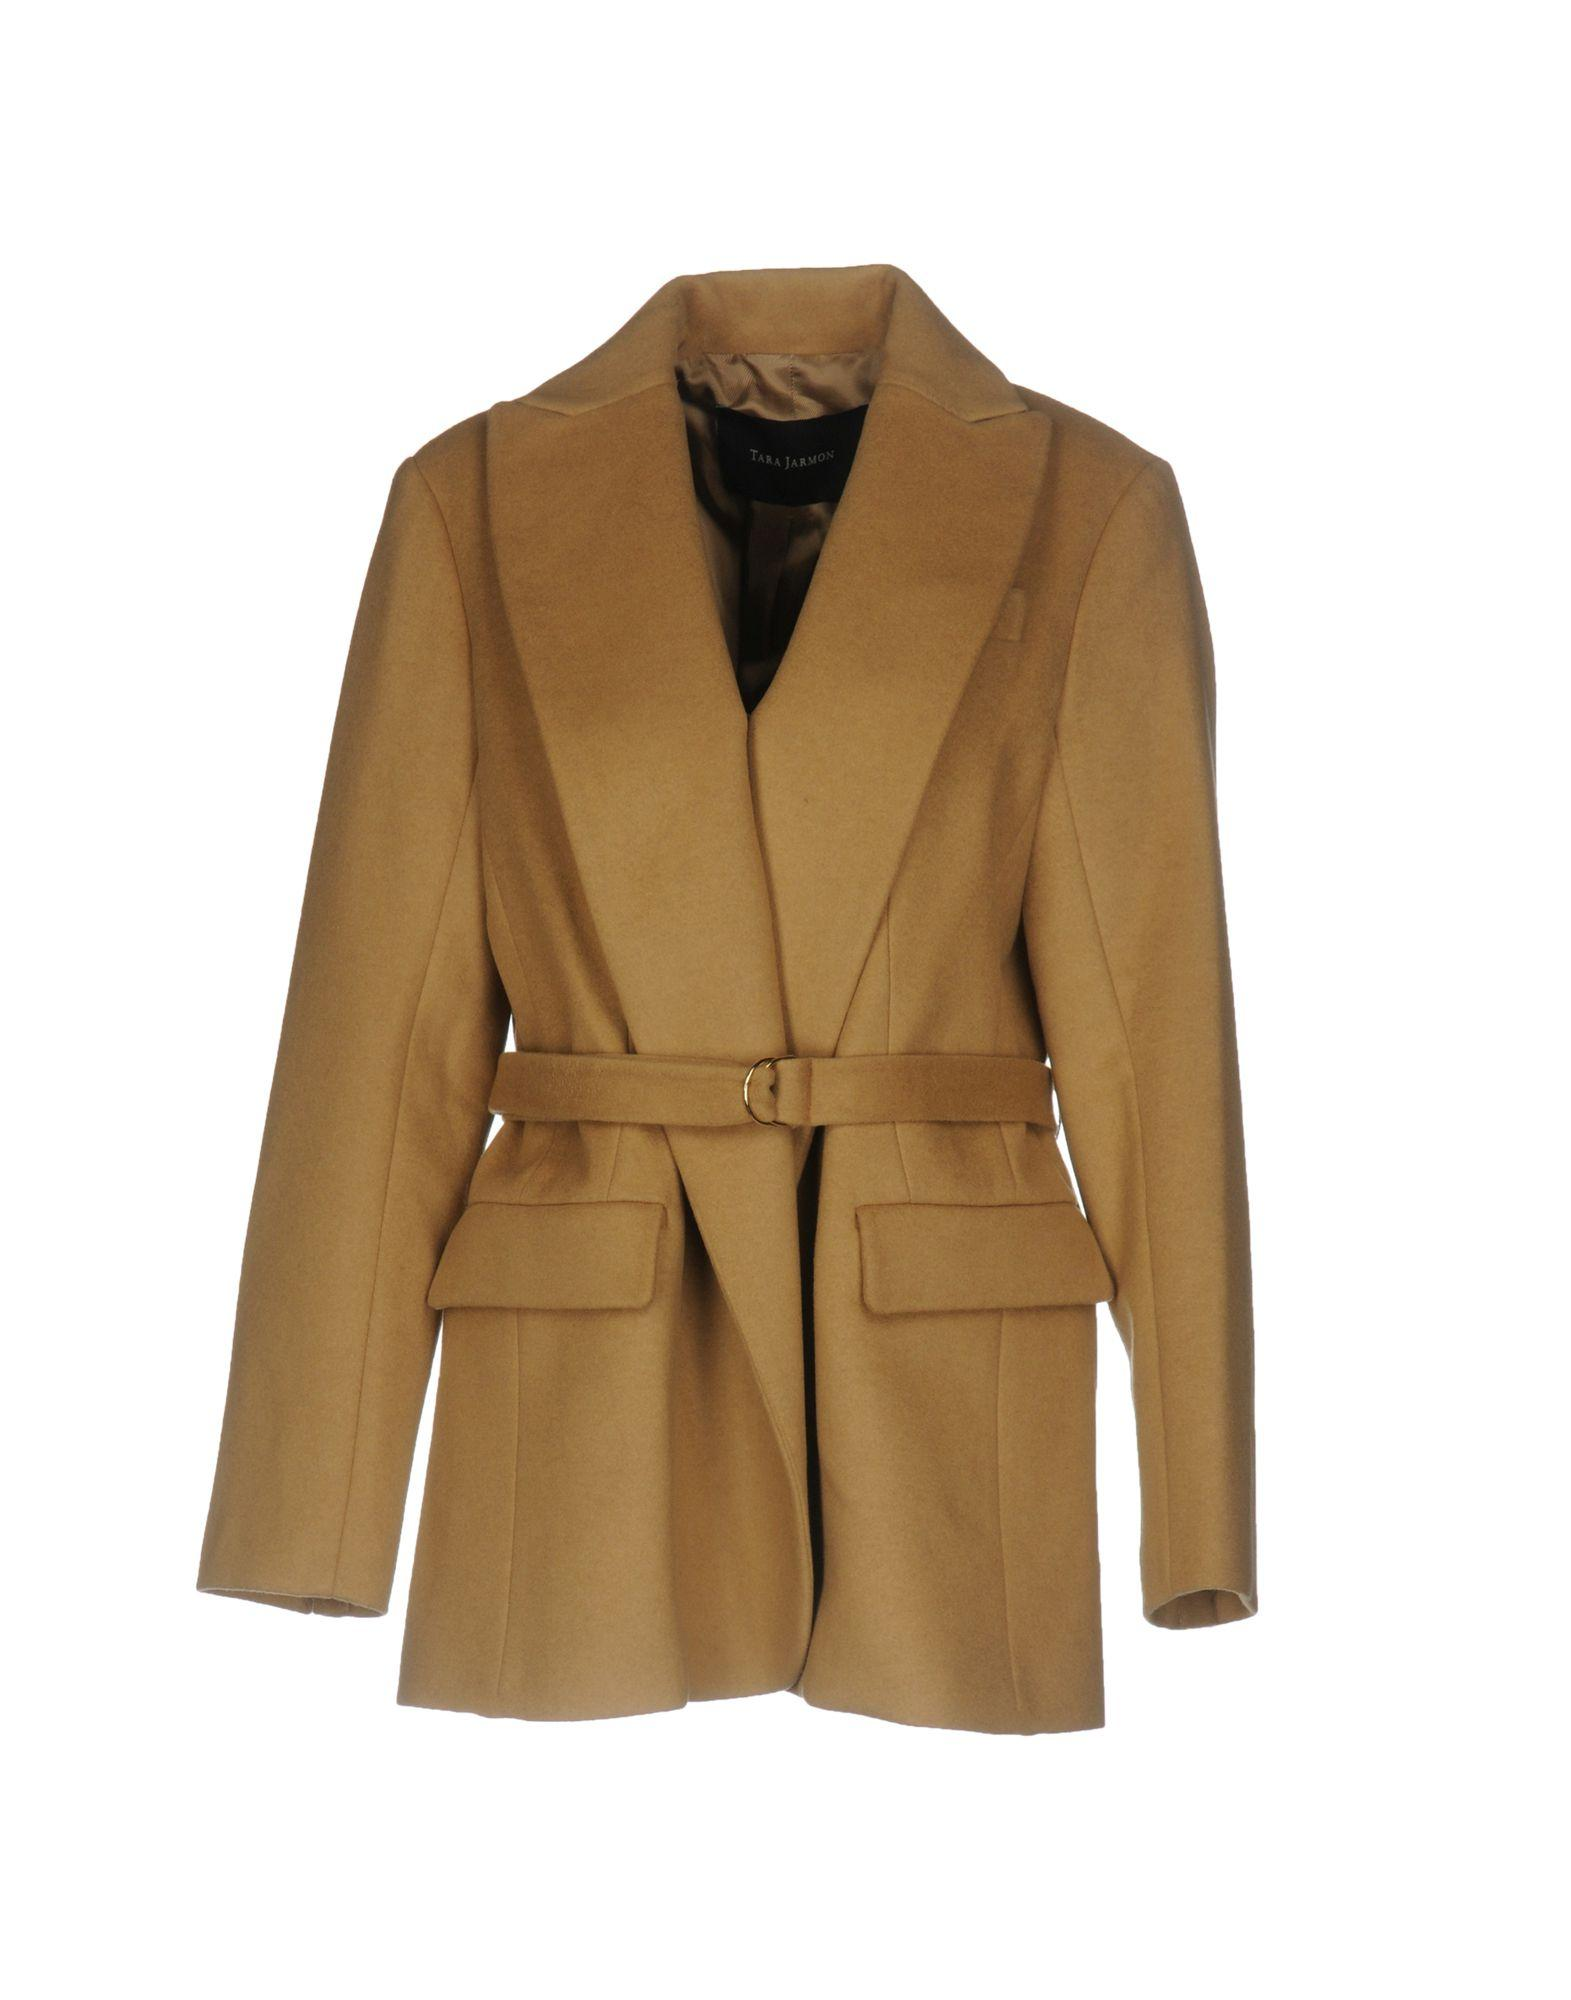 Tara Jarmon Belted Coats In Camel